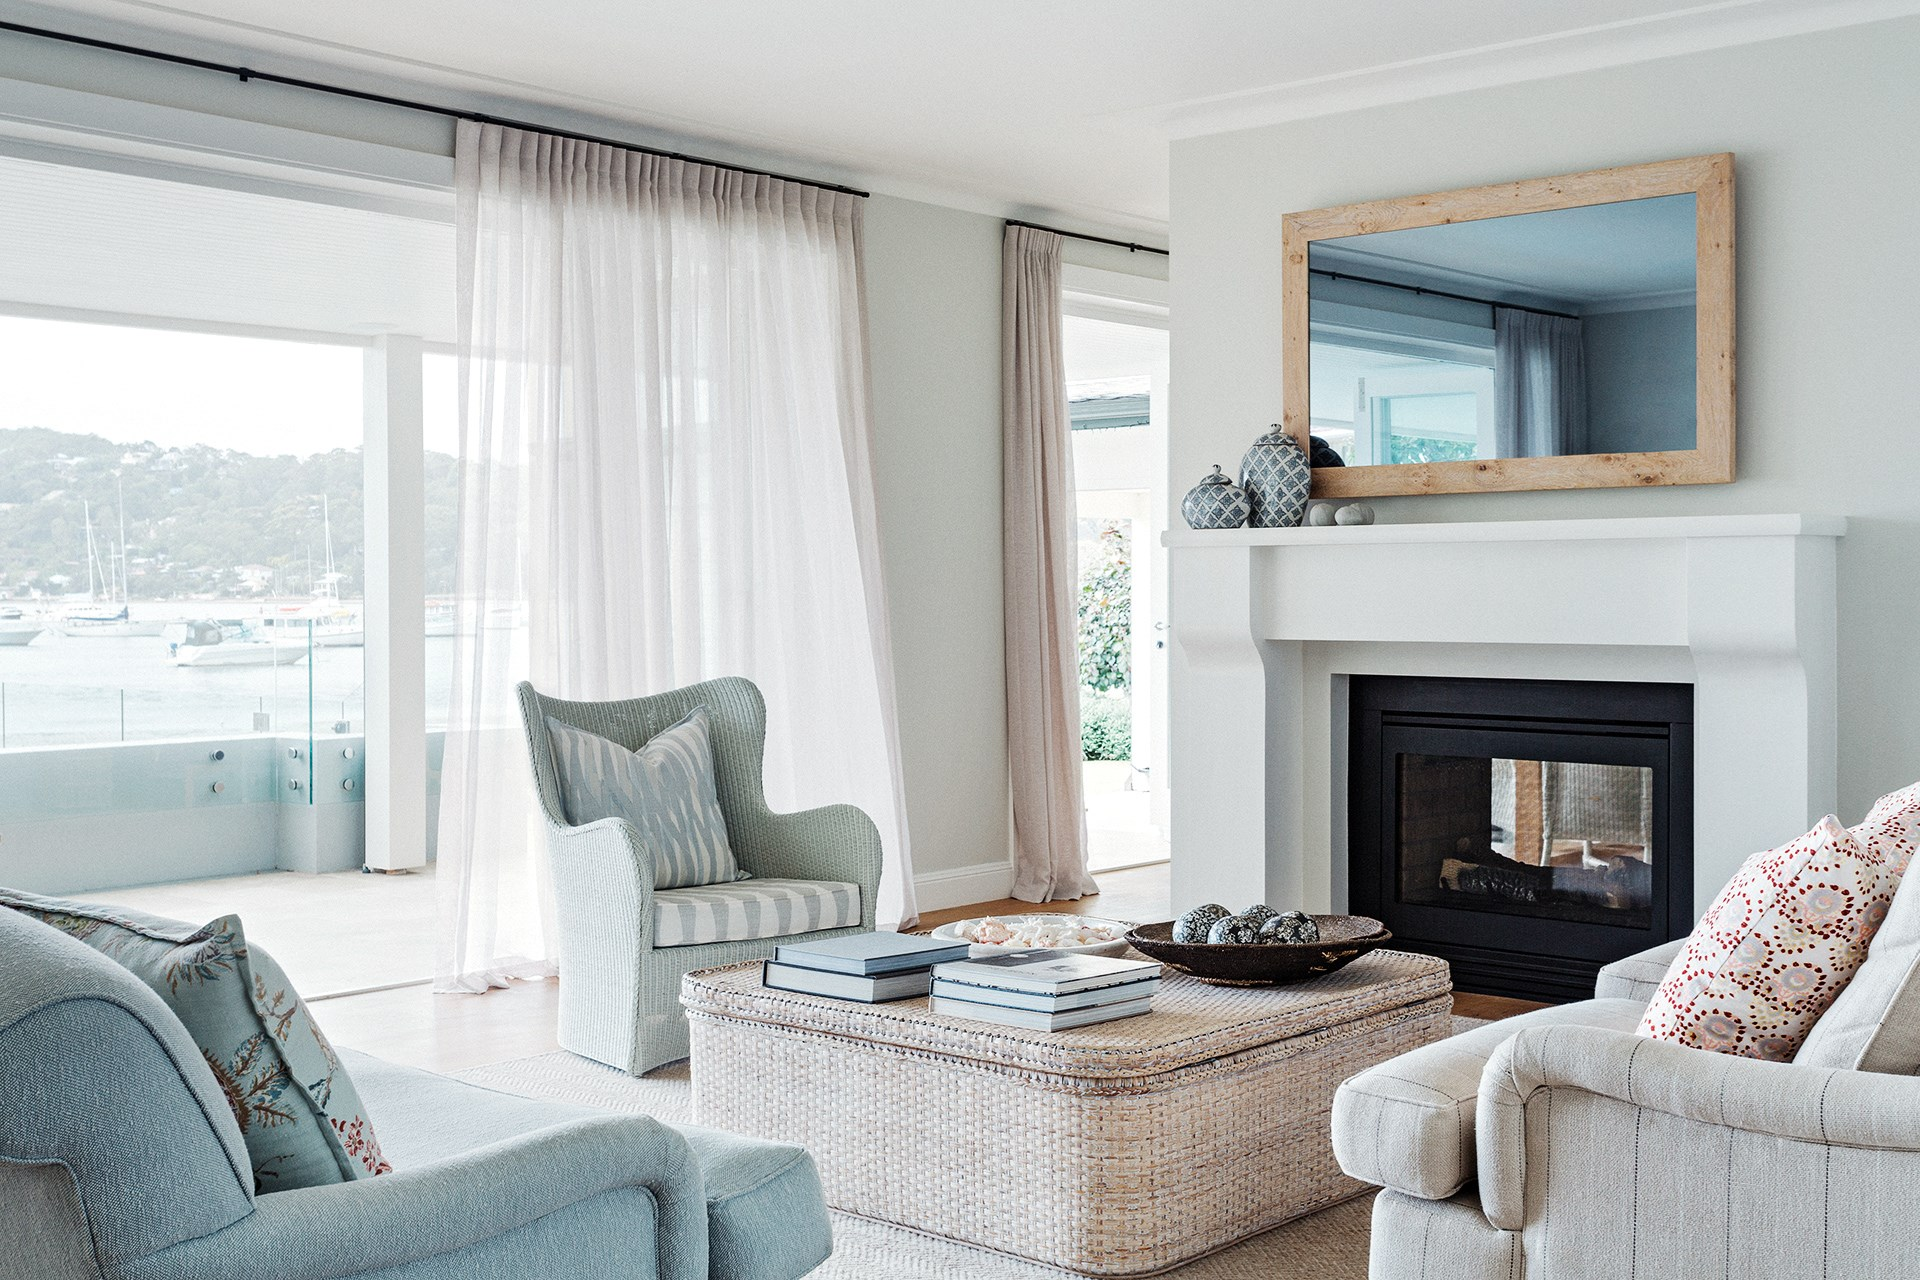 [Luxurious Hamptons-style beach house renovation](http://www.homestolove.com.au/gallery-luxurious-beach-house-renovation-2380). Photo: Felix Forest / *Belle*